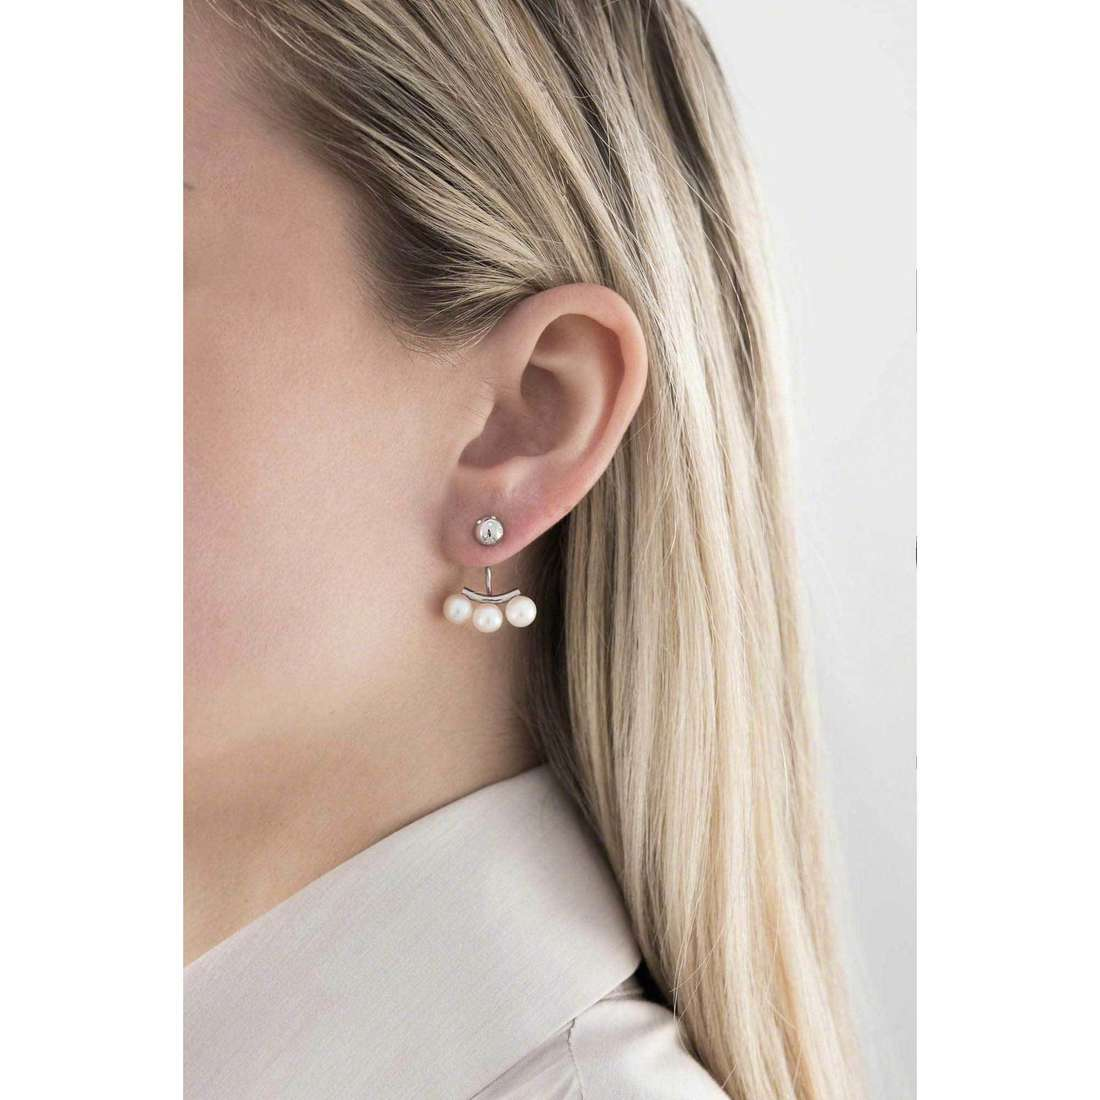 Morellato boucles d'oreille Lunae femme SADX10 indosso